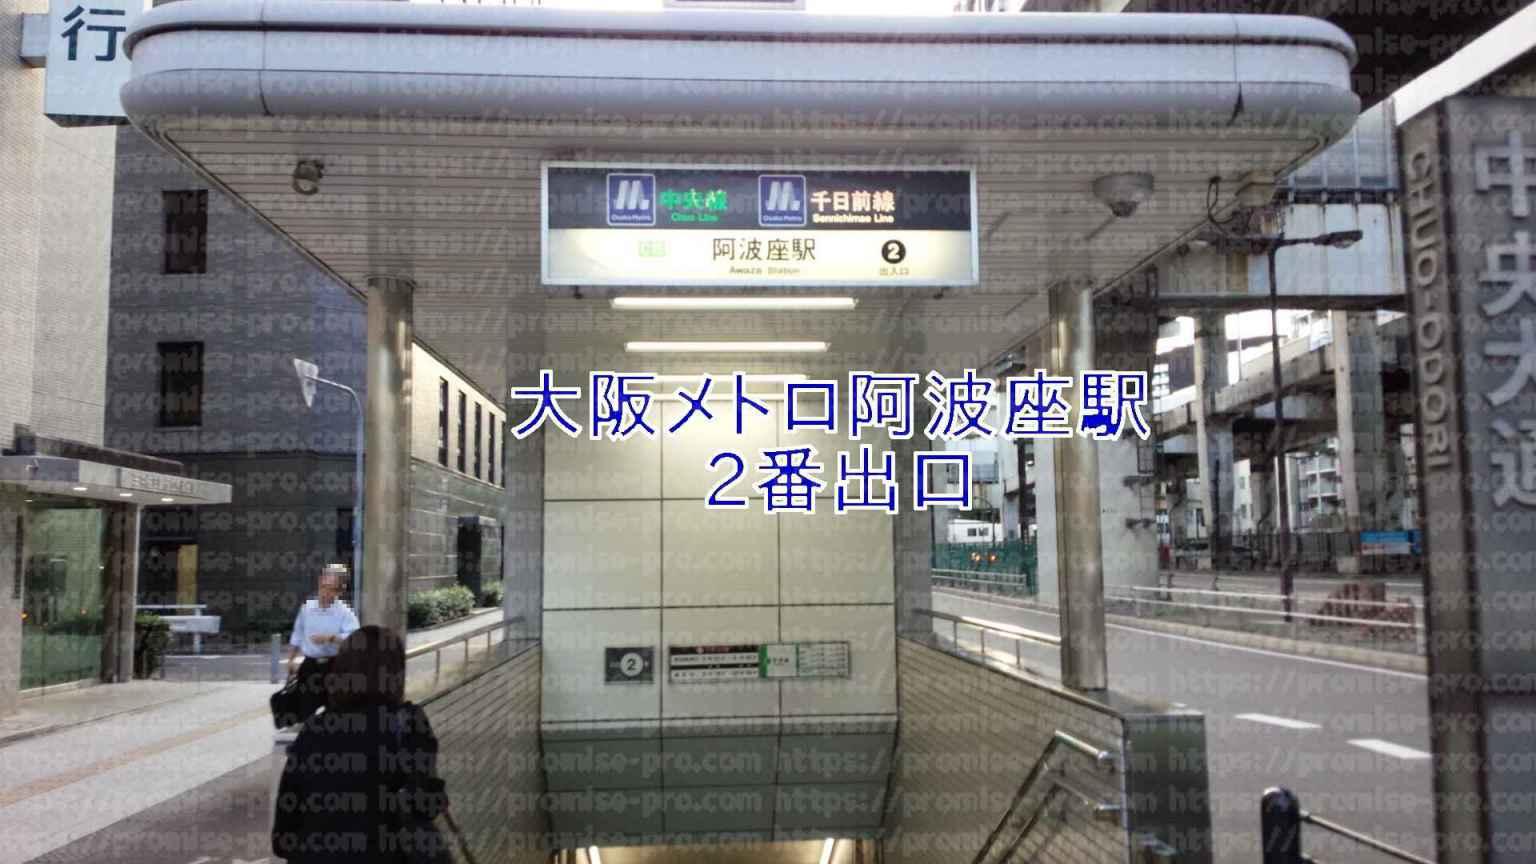 大阪メトロ 阿波座駅2番出口画像